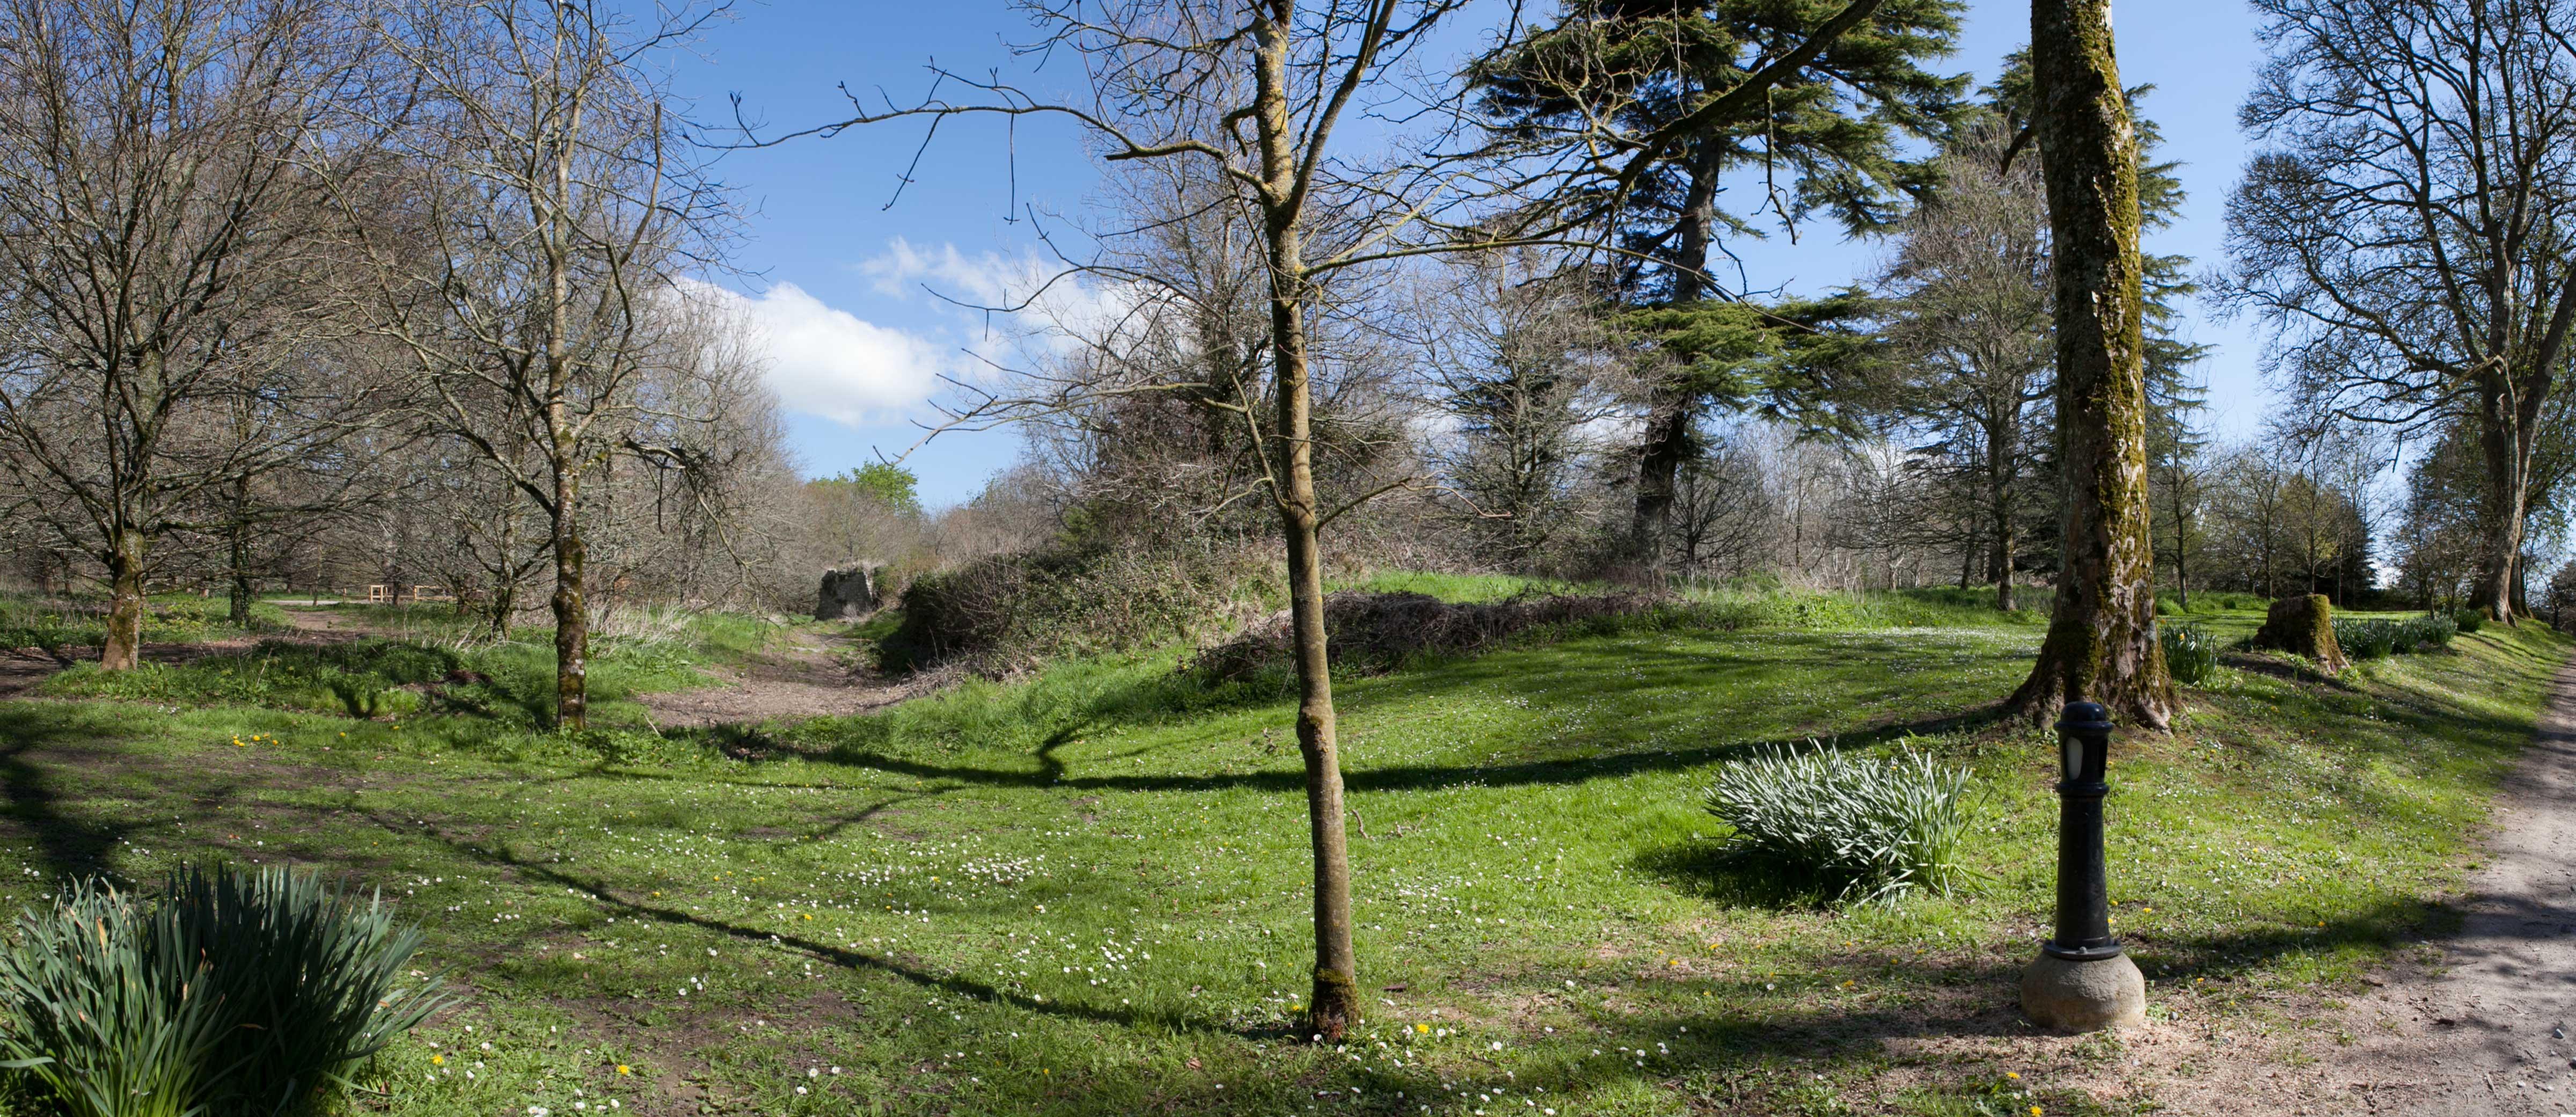 earthen embankment